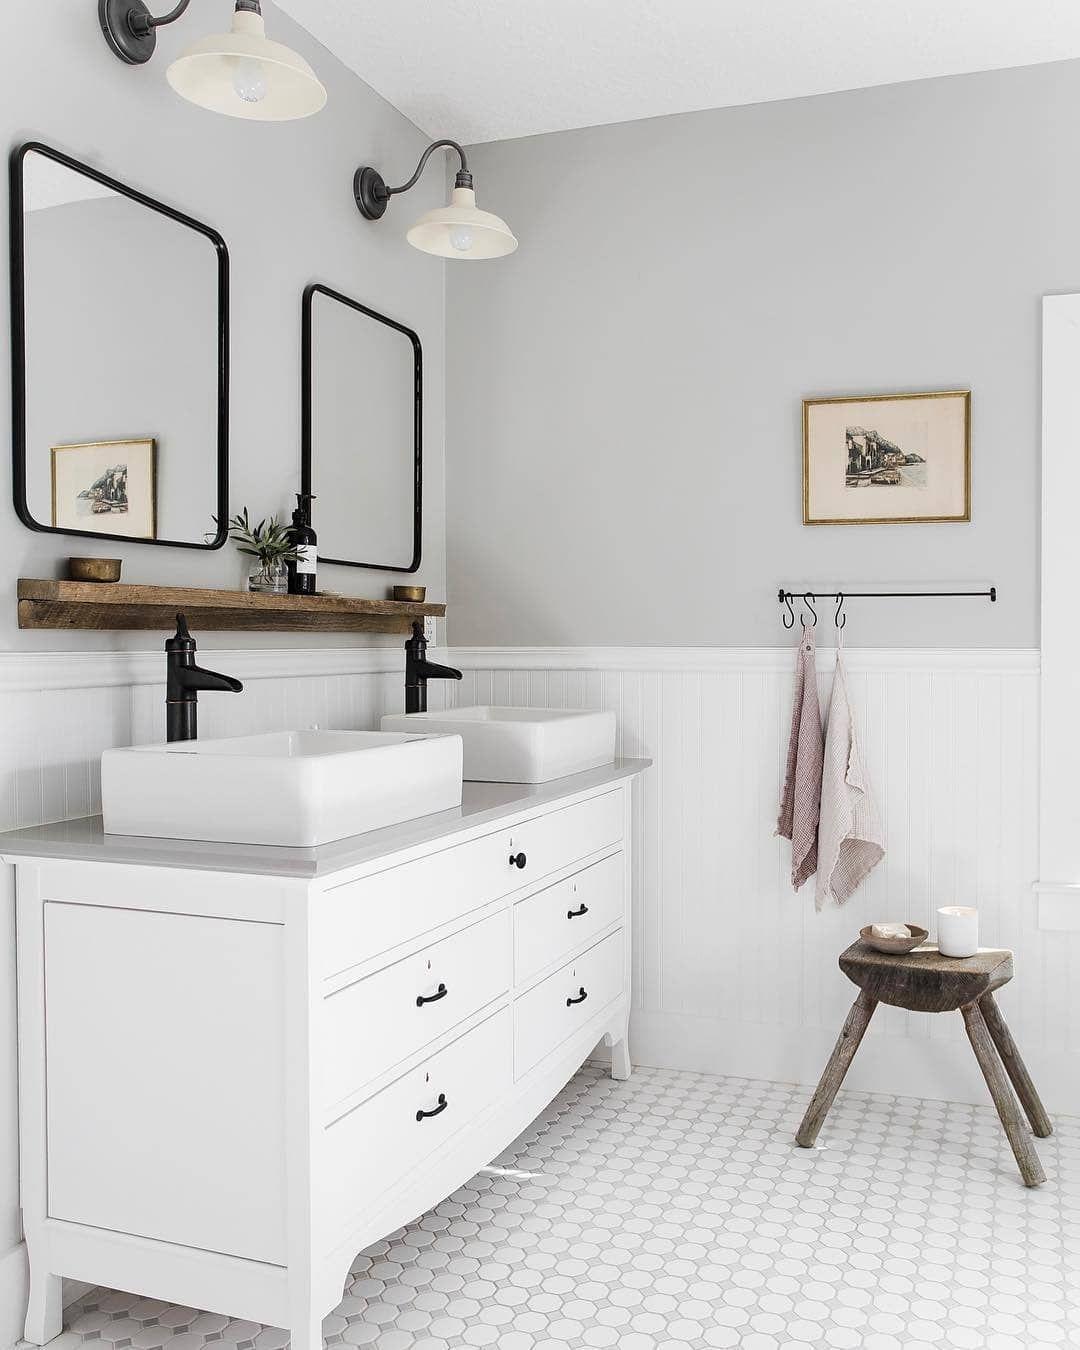 Serie 7 On Instagram Timeless Bathroom Design By Laineandlayne